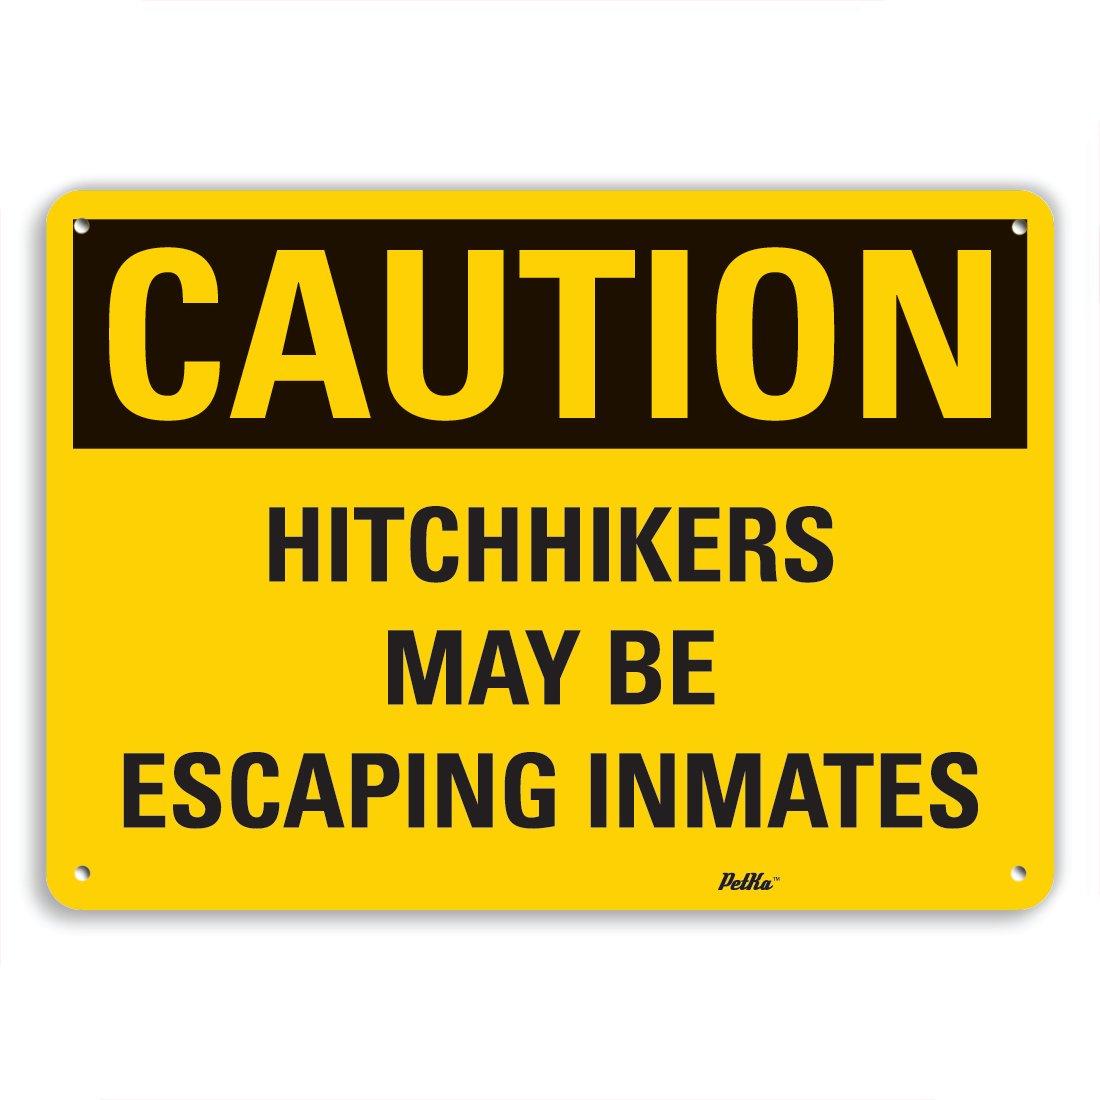 PetKa Signs and Graphics PKFO-0190-NA_10x7 Hitchhikers may be Escaping inmates Aluminum Sign, 10'' x 7''